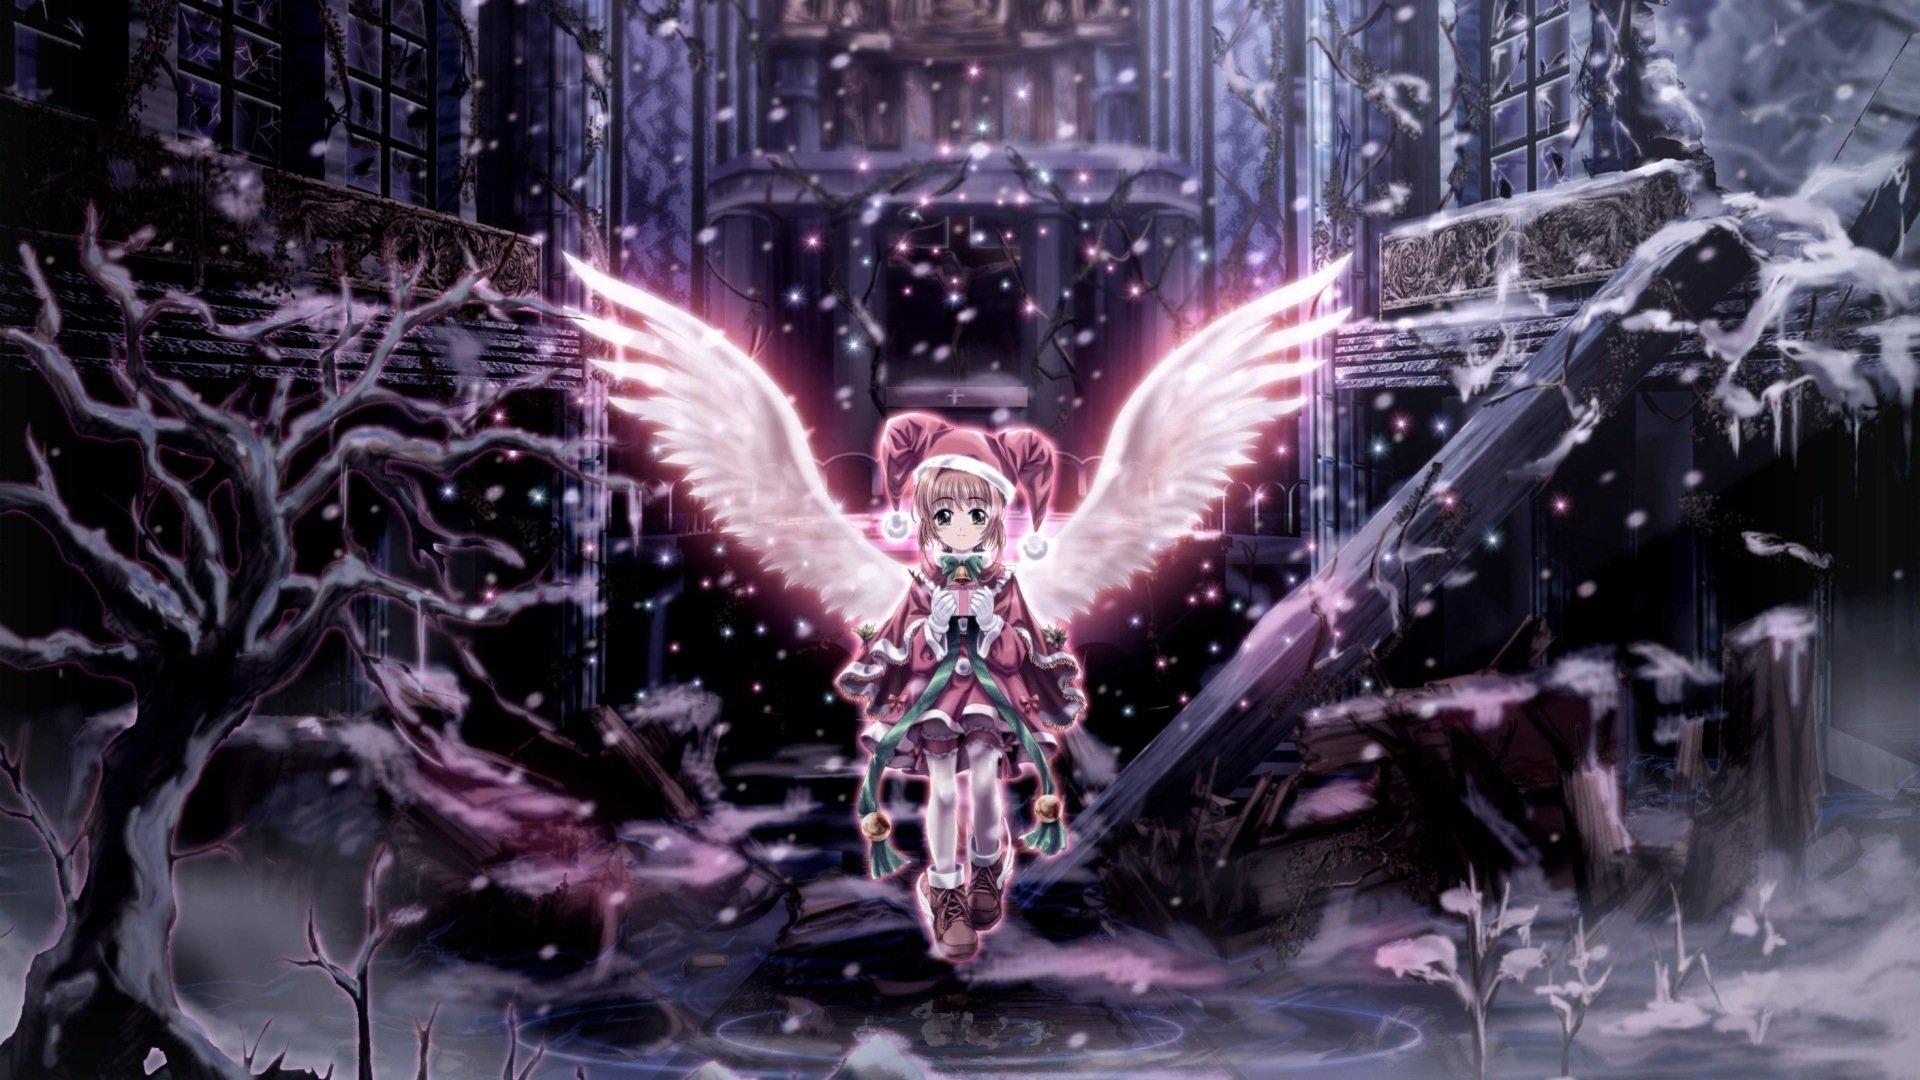 Anime - Cardcaptor Sakura  Angel Wallpaper